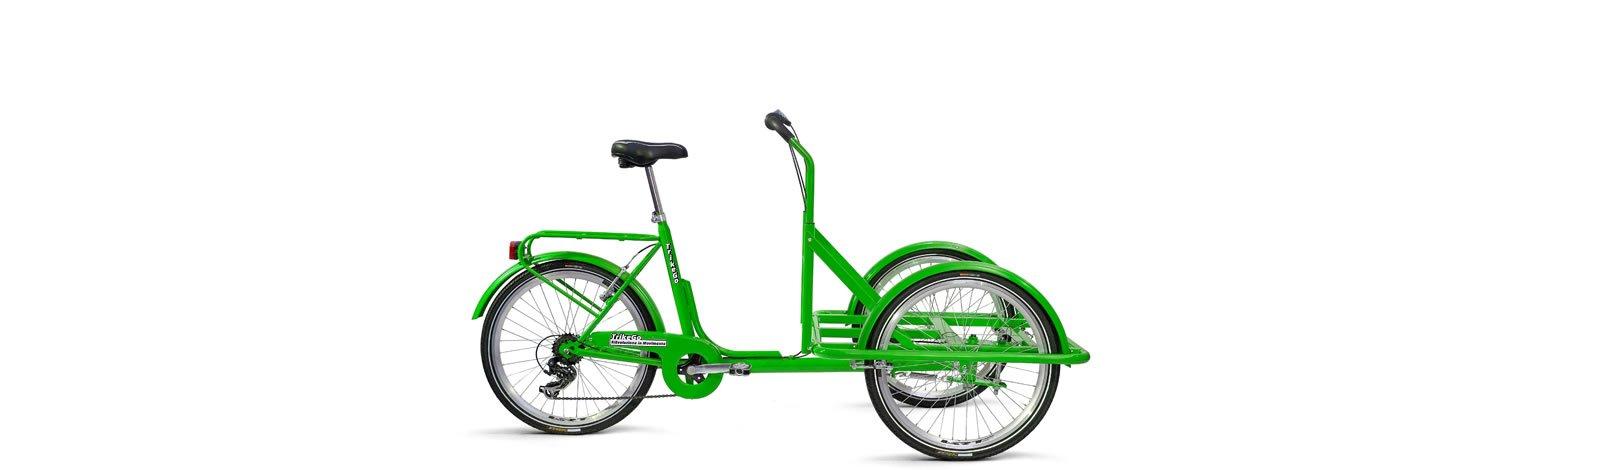 TrikeGo Cargobike- solo telaio - verde